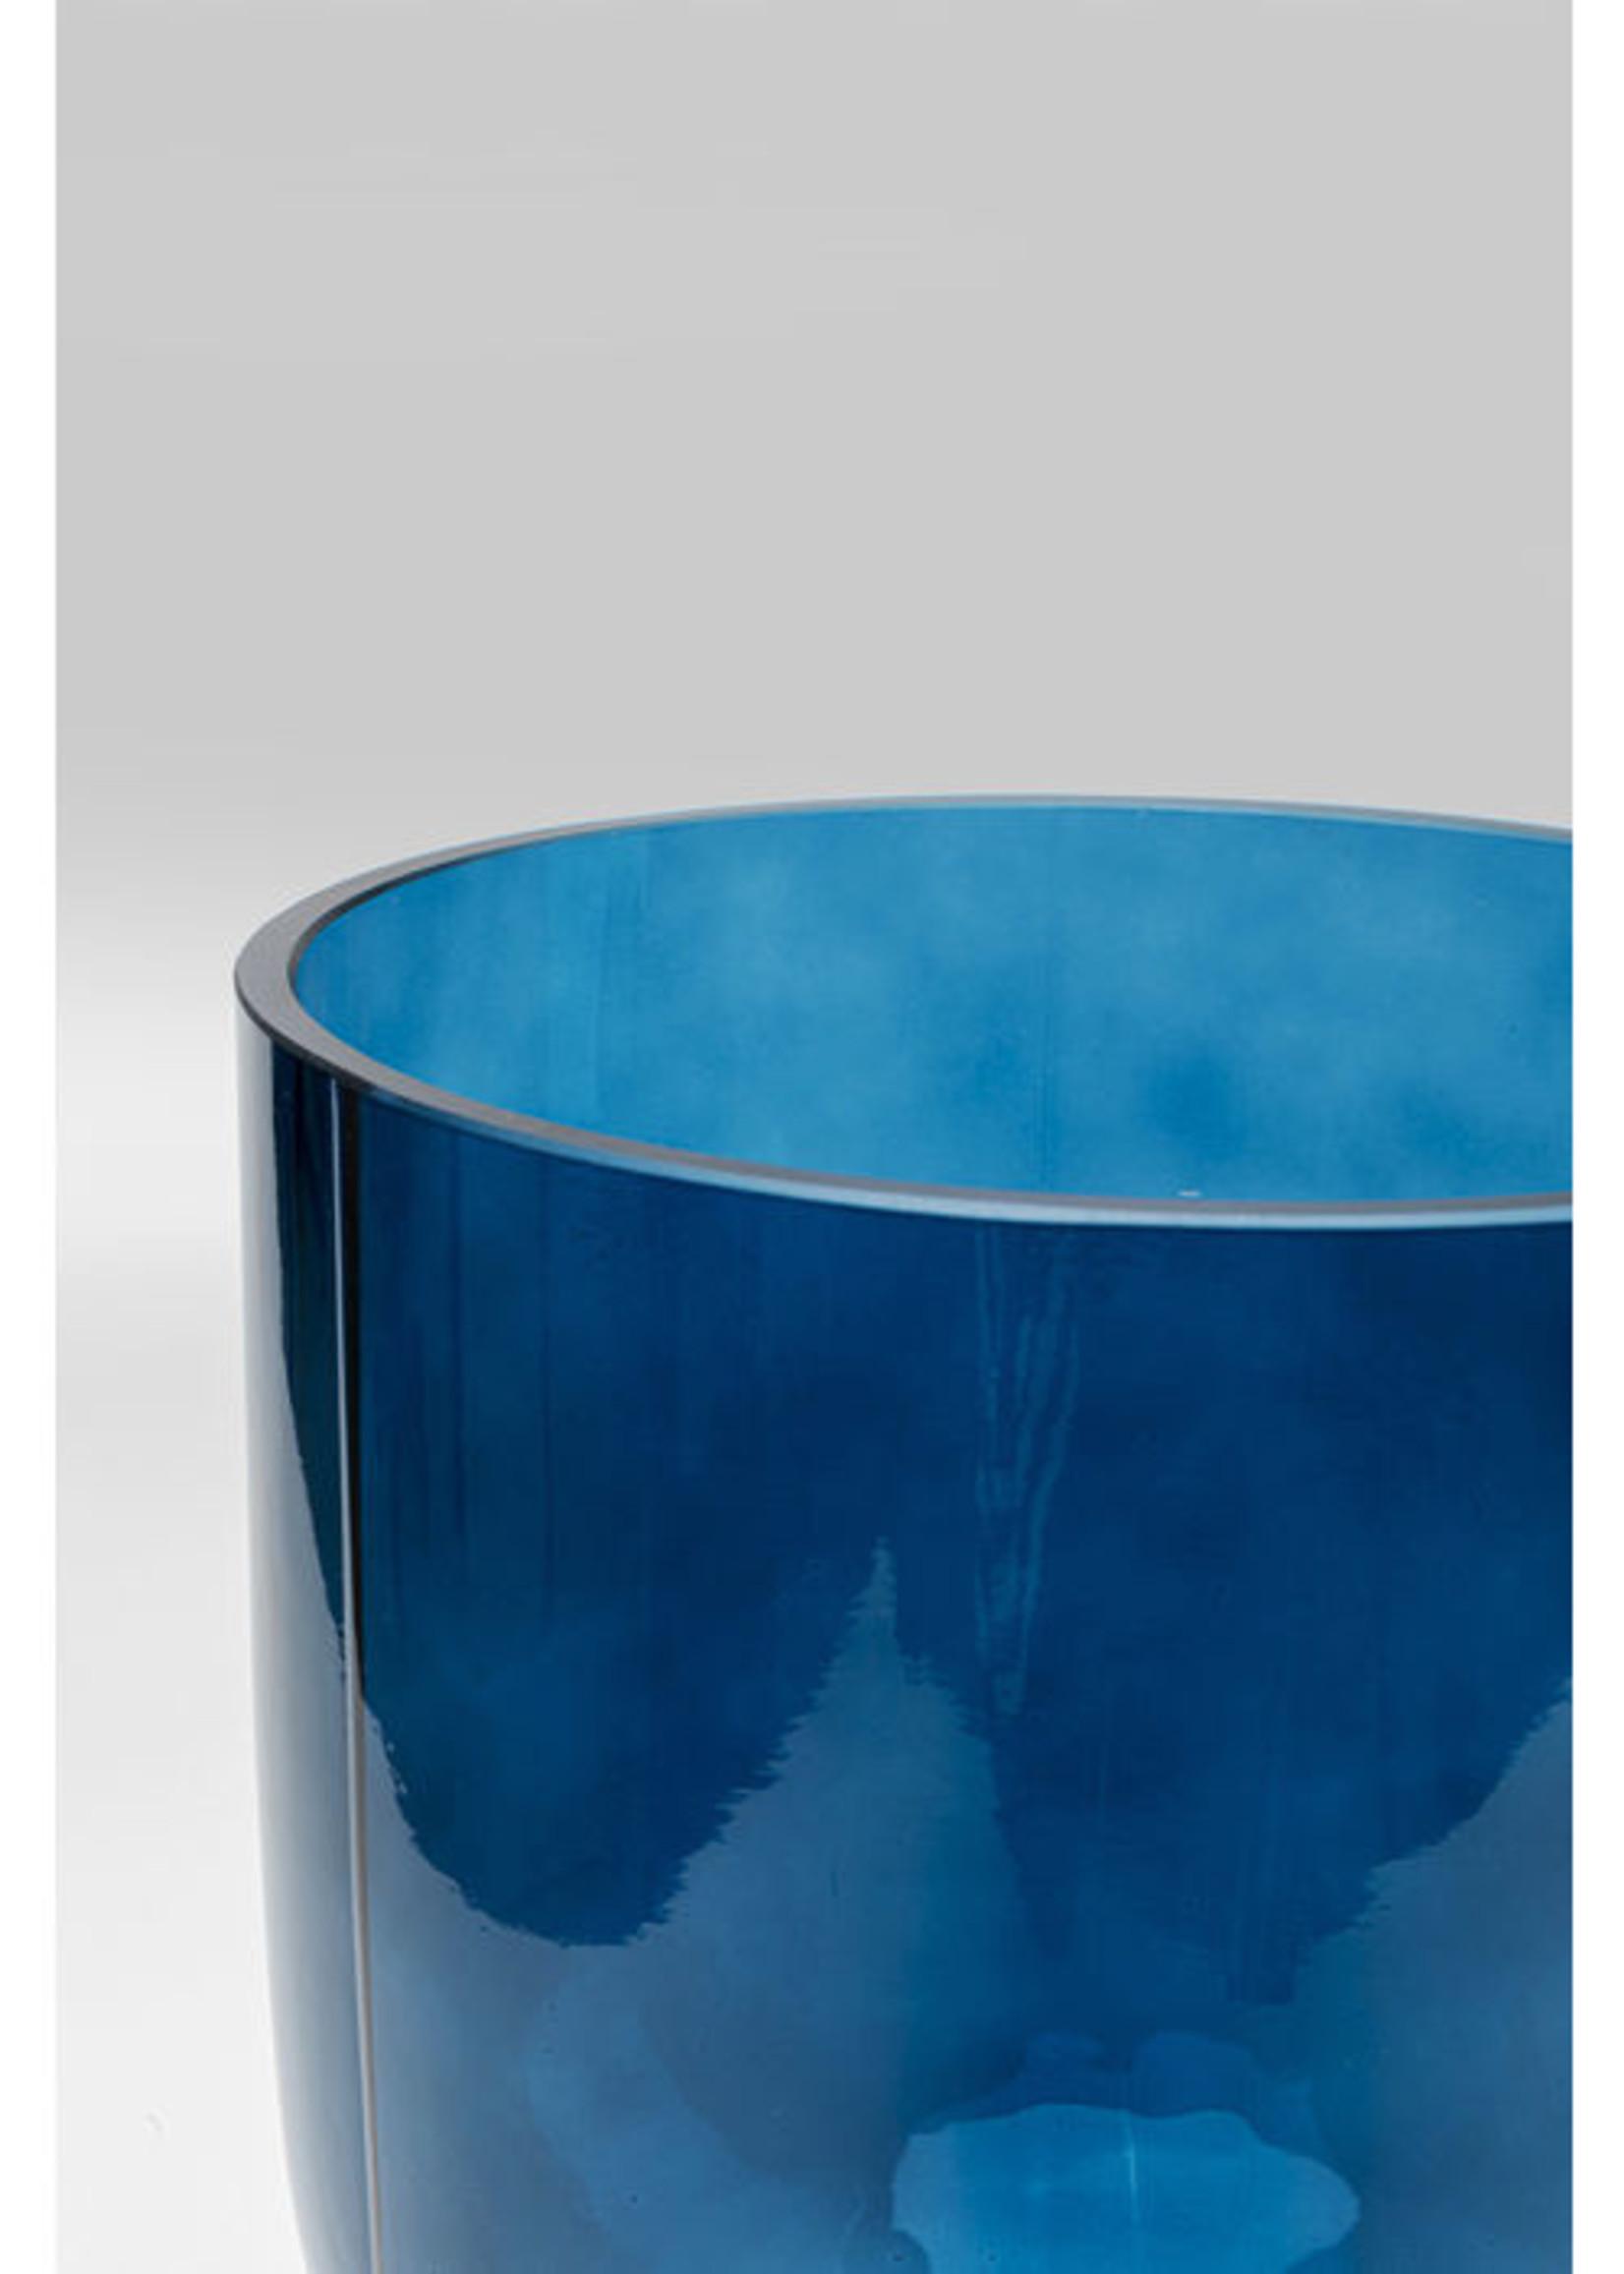 KARE DESIGN Vase Marvelous Duo Blue Purple 40